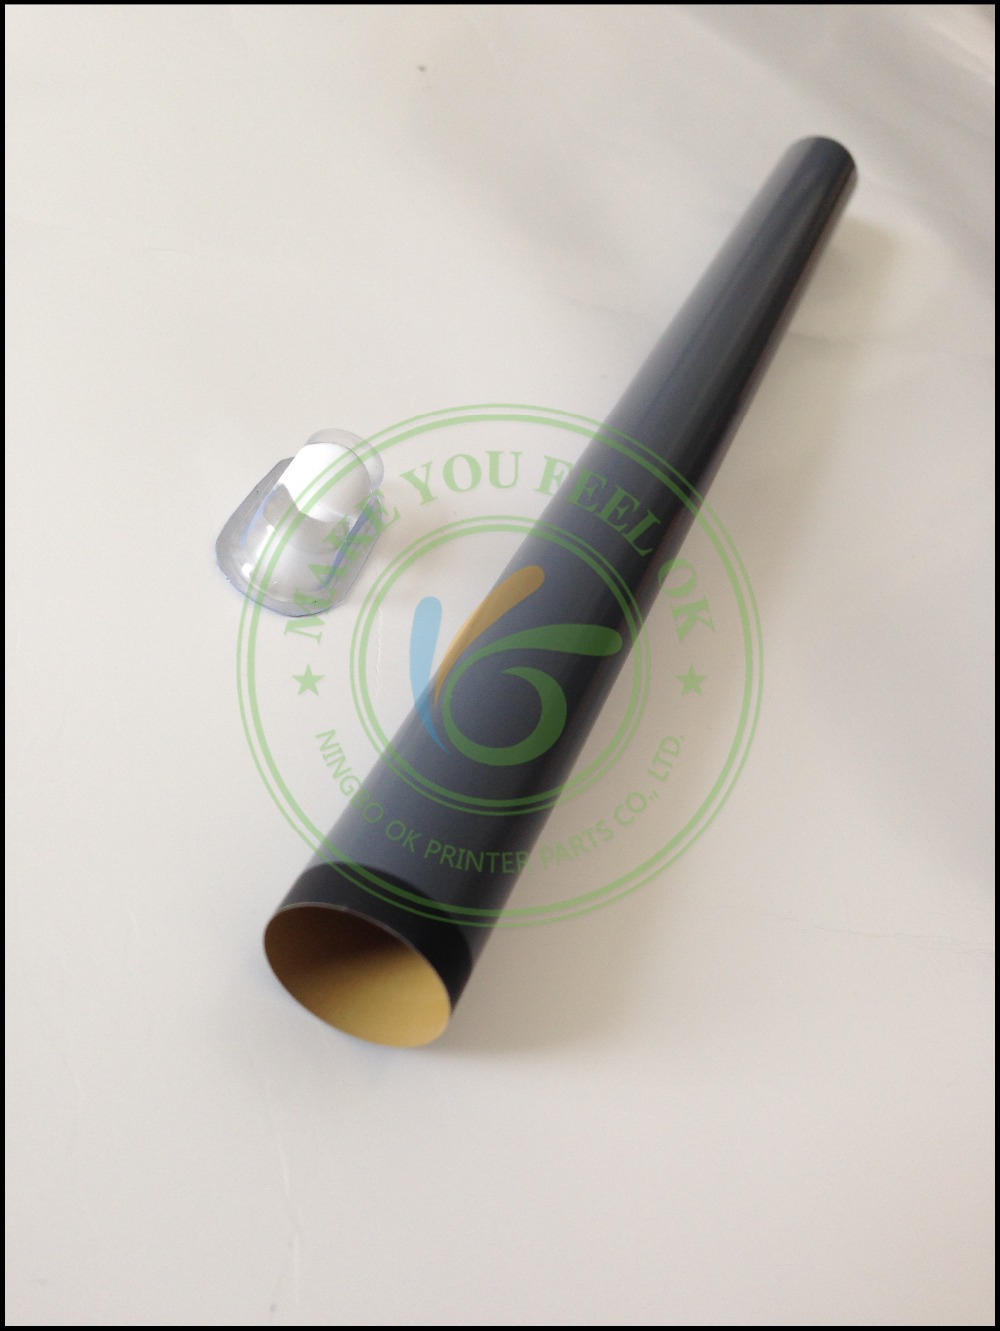 ORIGINAL Fuser Fixing Film Sleeve Teflon + grease for HP 1000 1005 1160 1200 1220 1300 1320 1010 1020 1022 3050 3015 P2014 P2015 original fuser film sleeve fixing film sleeve teflon grease for hp p2035 p2055 p2030 p2050 m2727 p2014 pro 400 m400 m401 m425